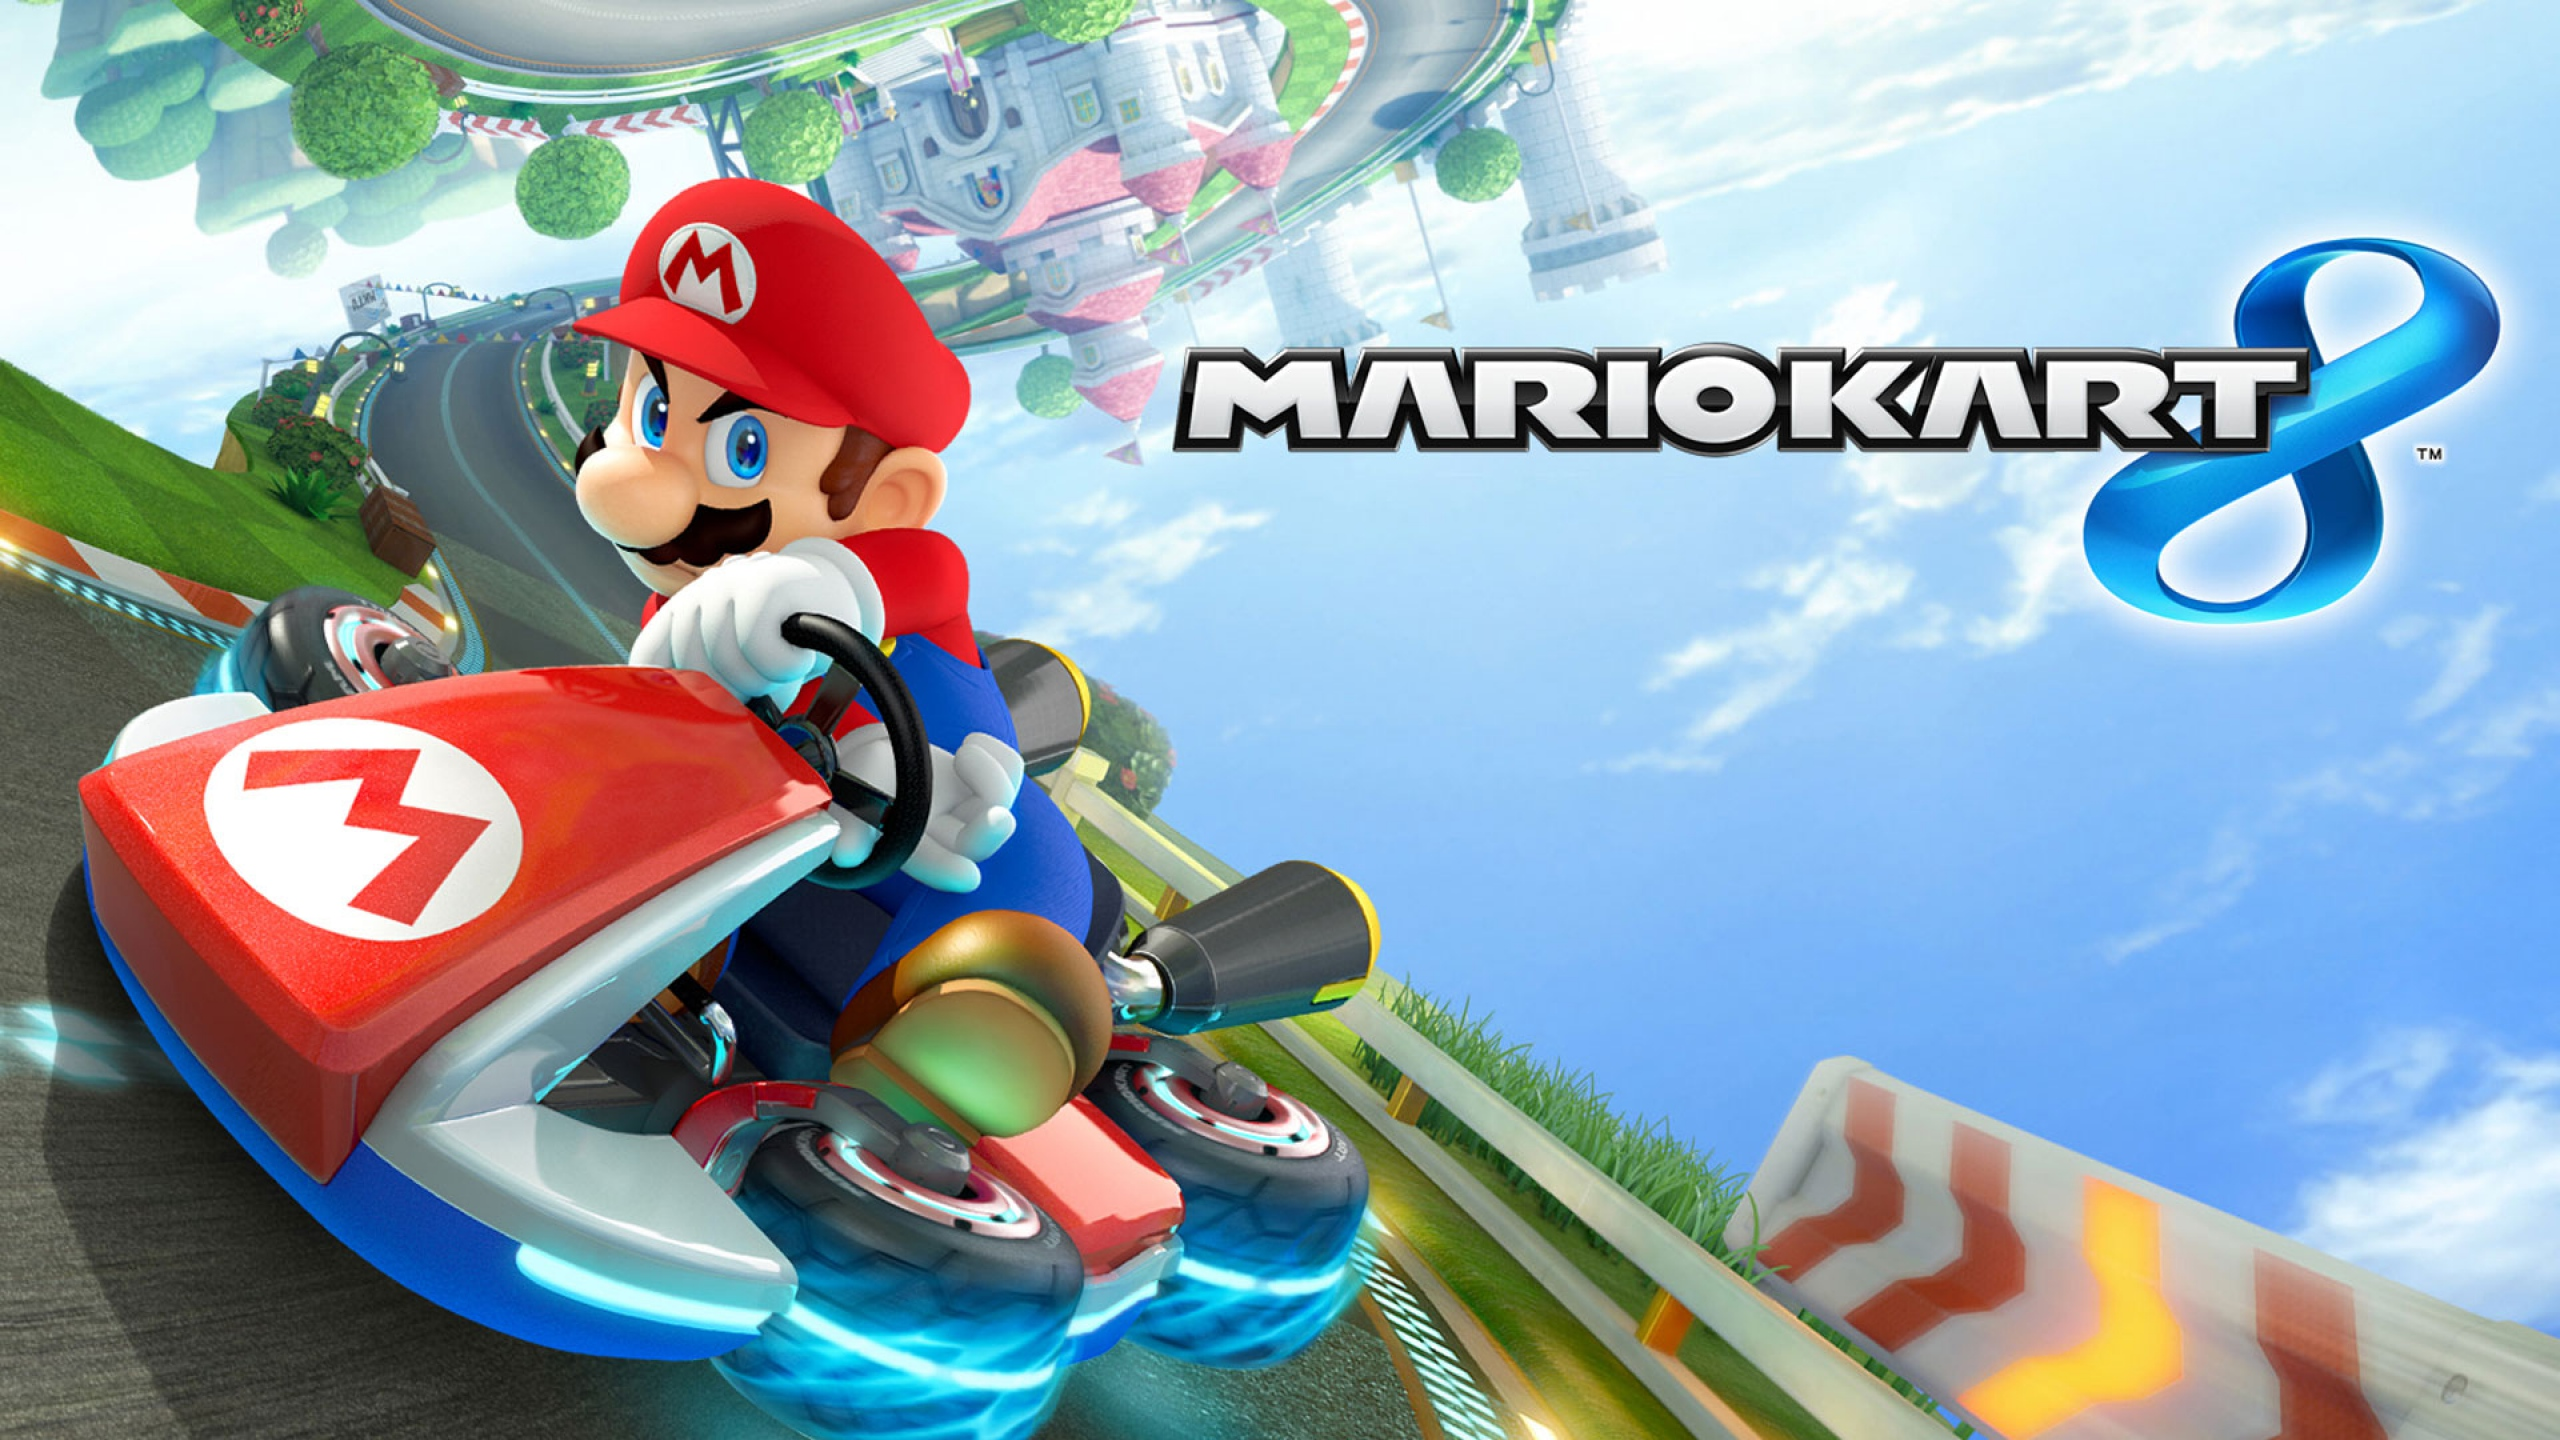 Wii u se pone en movimiento con mario kart 8 geek chic for Coupe miroir mario kart wii